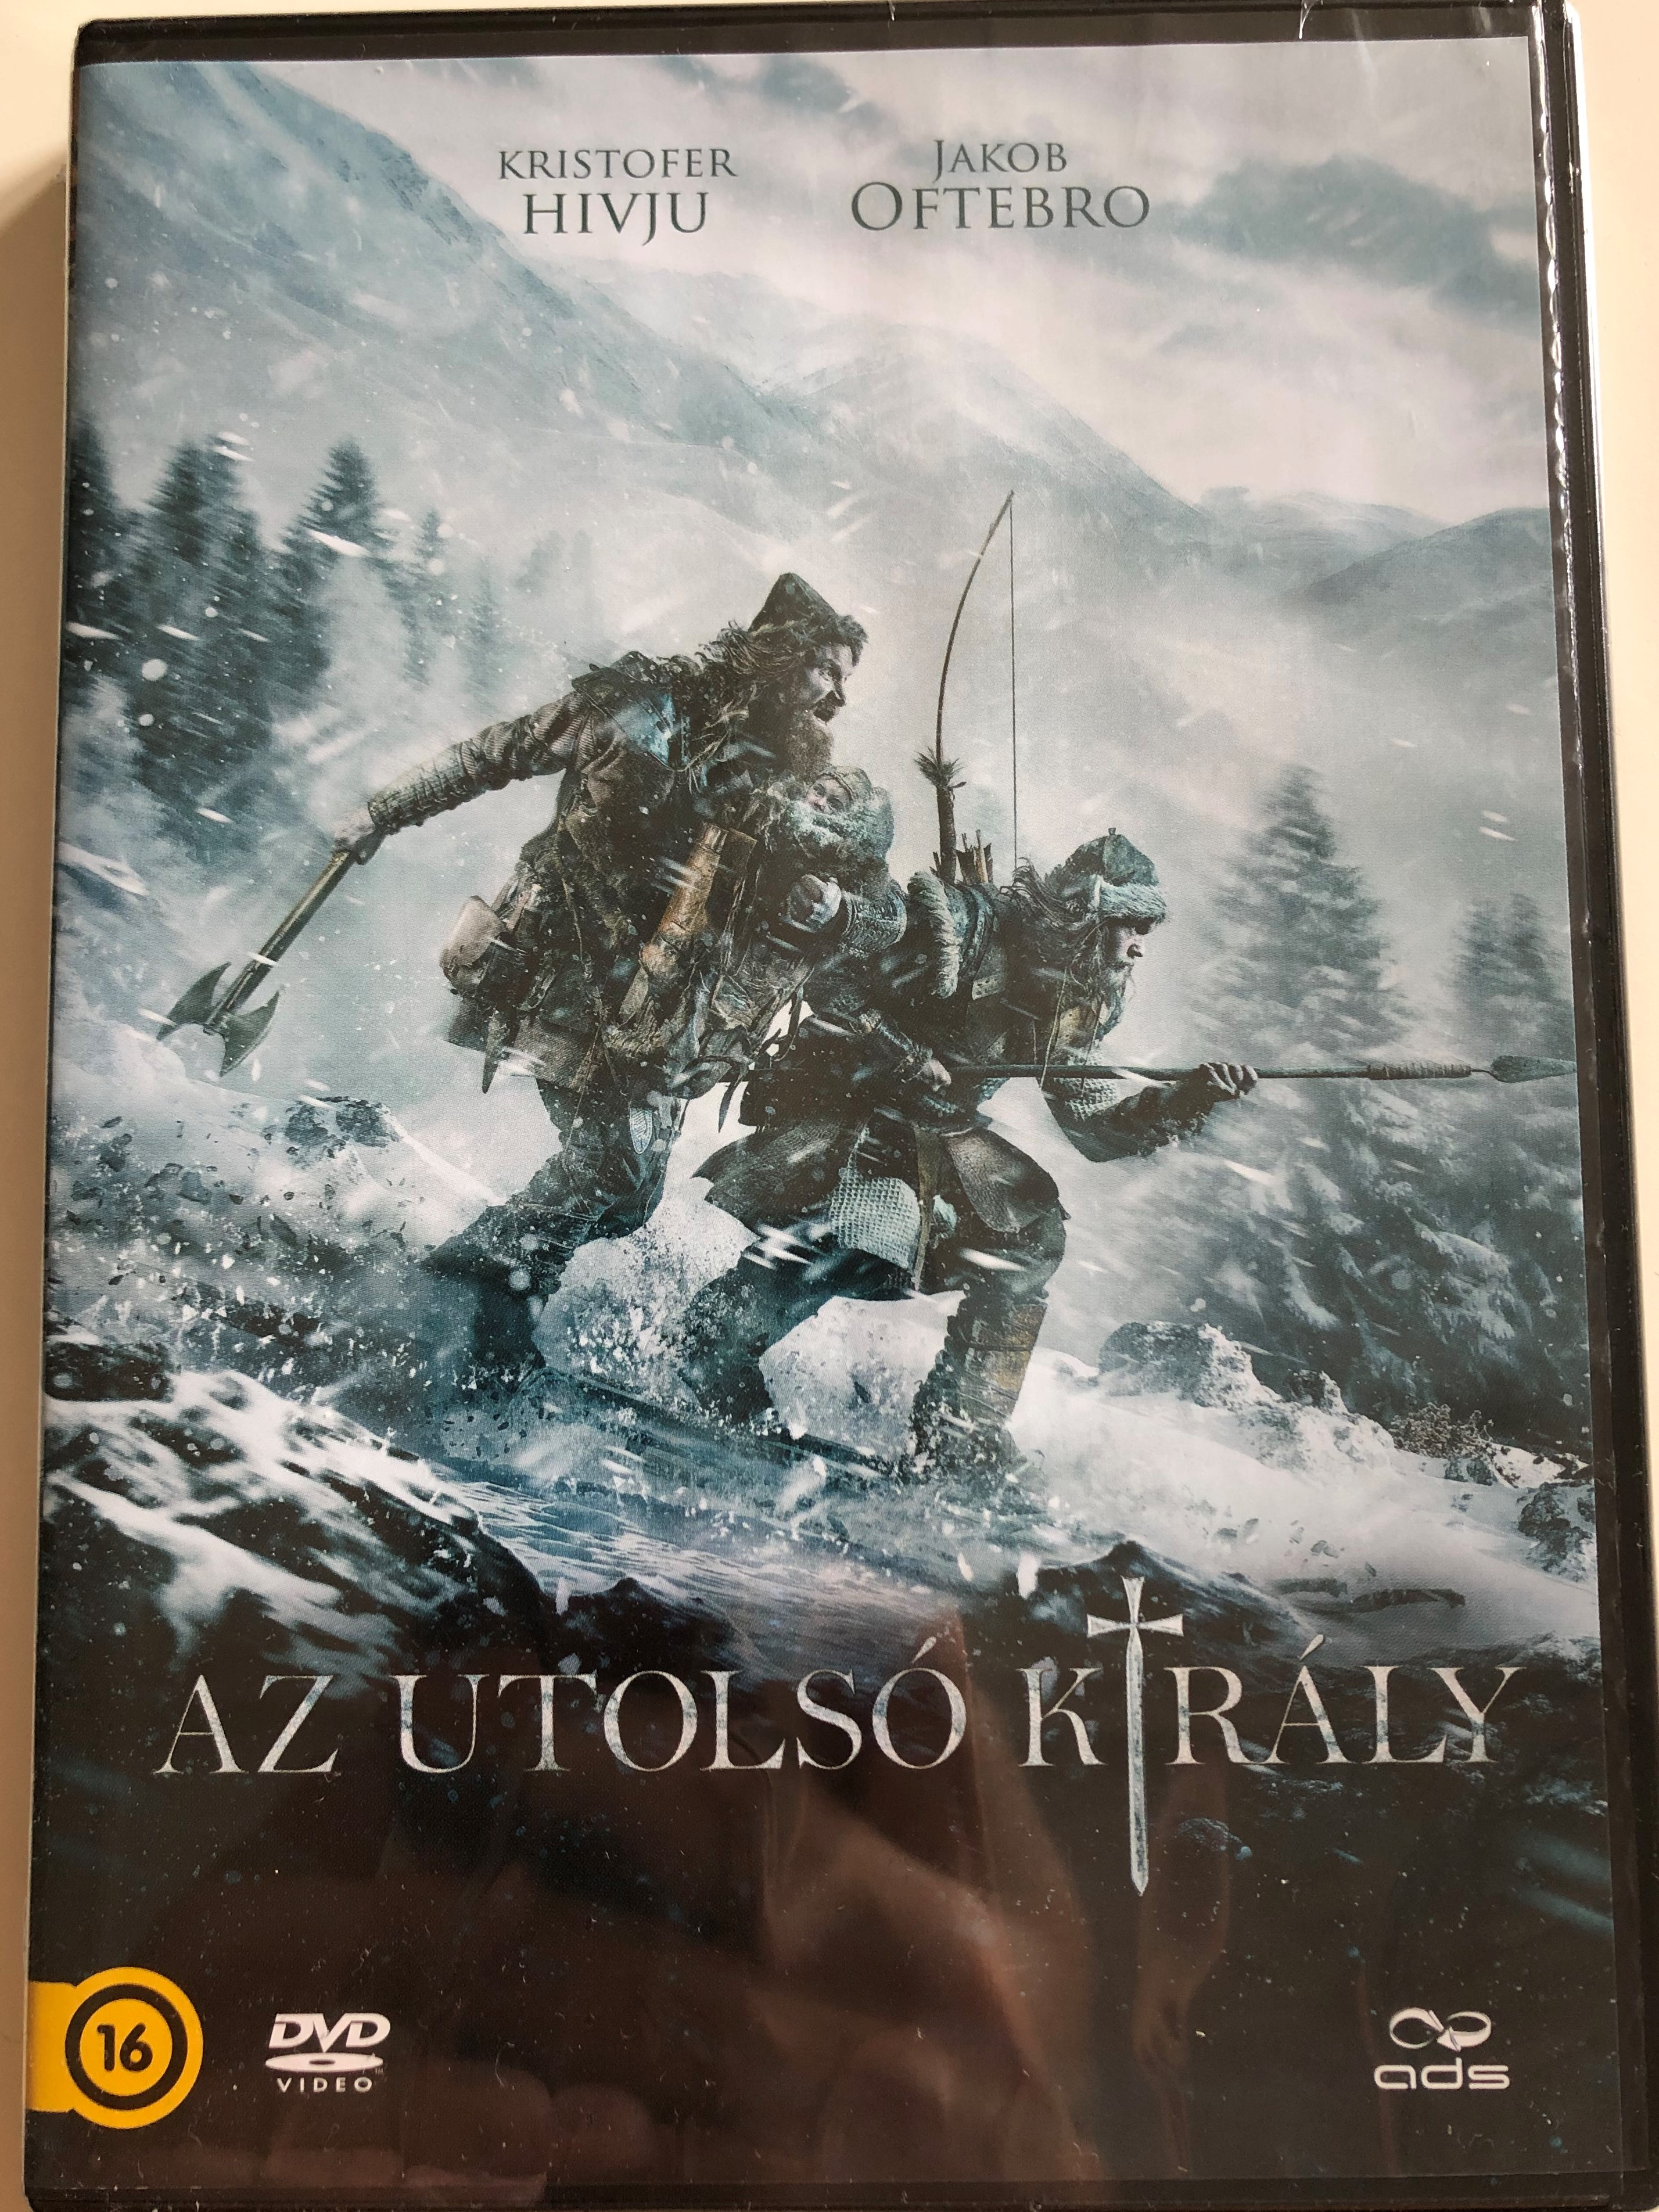 birkebeinerne-the-last-king-dvd-2015-az-utols-kir-ly-directed-by-nils-gaup-starring-jakob-oftebro-kristofer-hivju-thorbj-rn-harr-p-l-sverre-valheim-hagen-ane-ulmoen-verli-1-.jpg